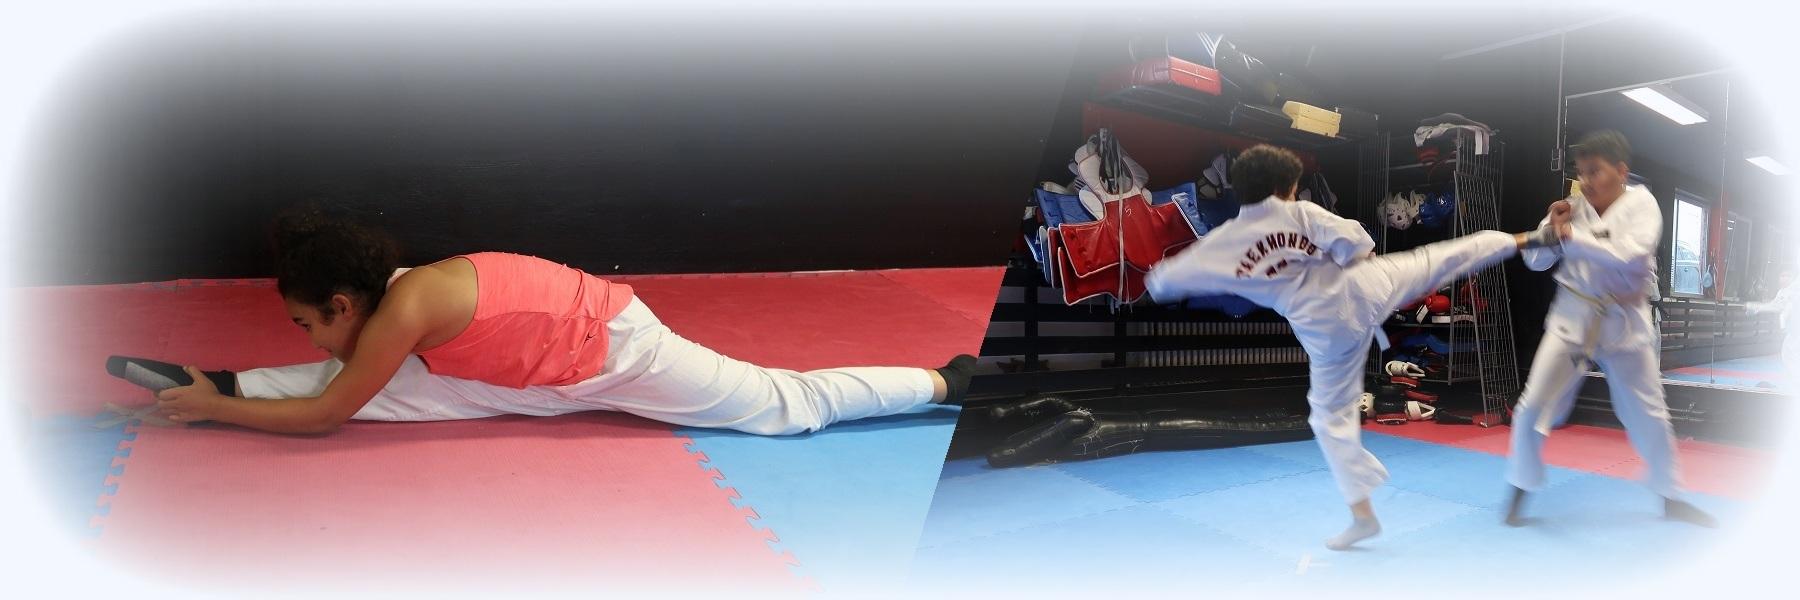 Taekwondo-KuJ-Header-2